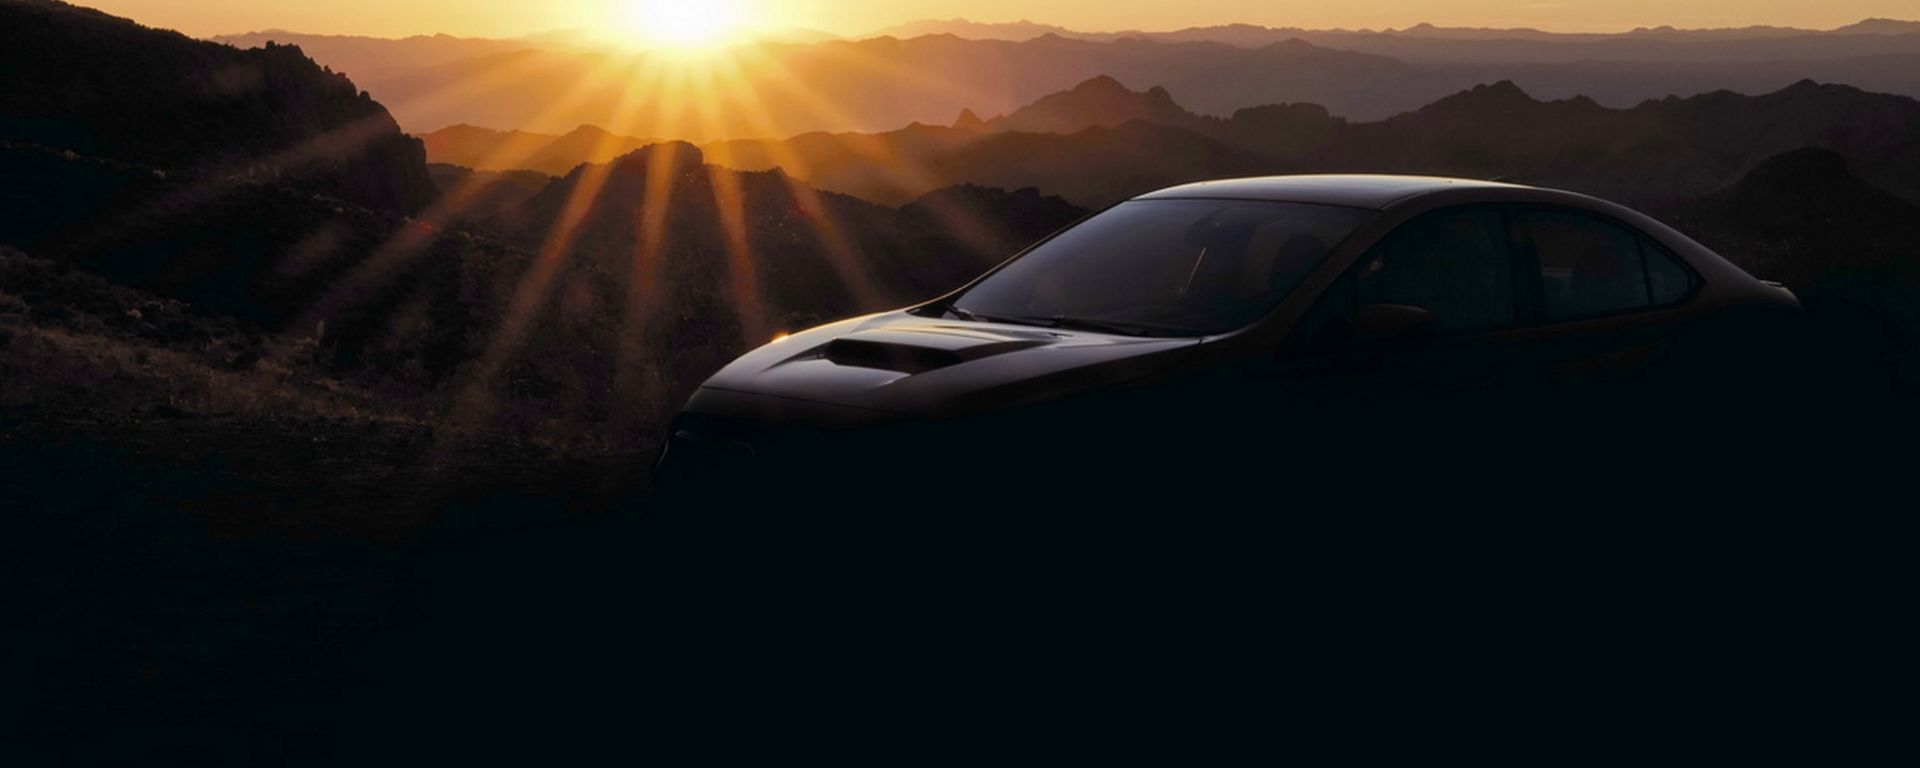 Nuova Subaru WRX, primo teaser